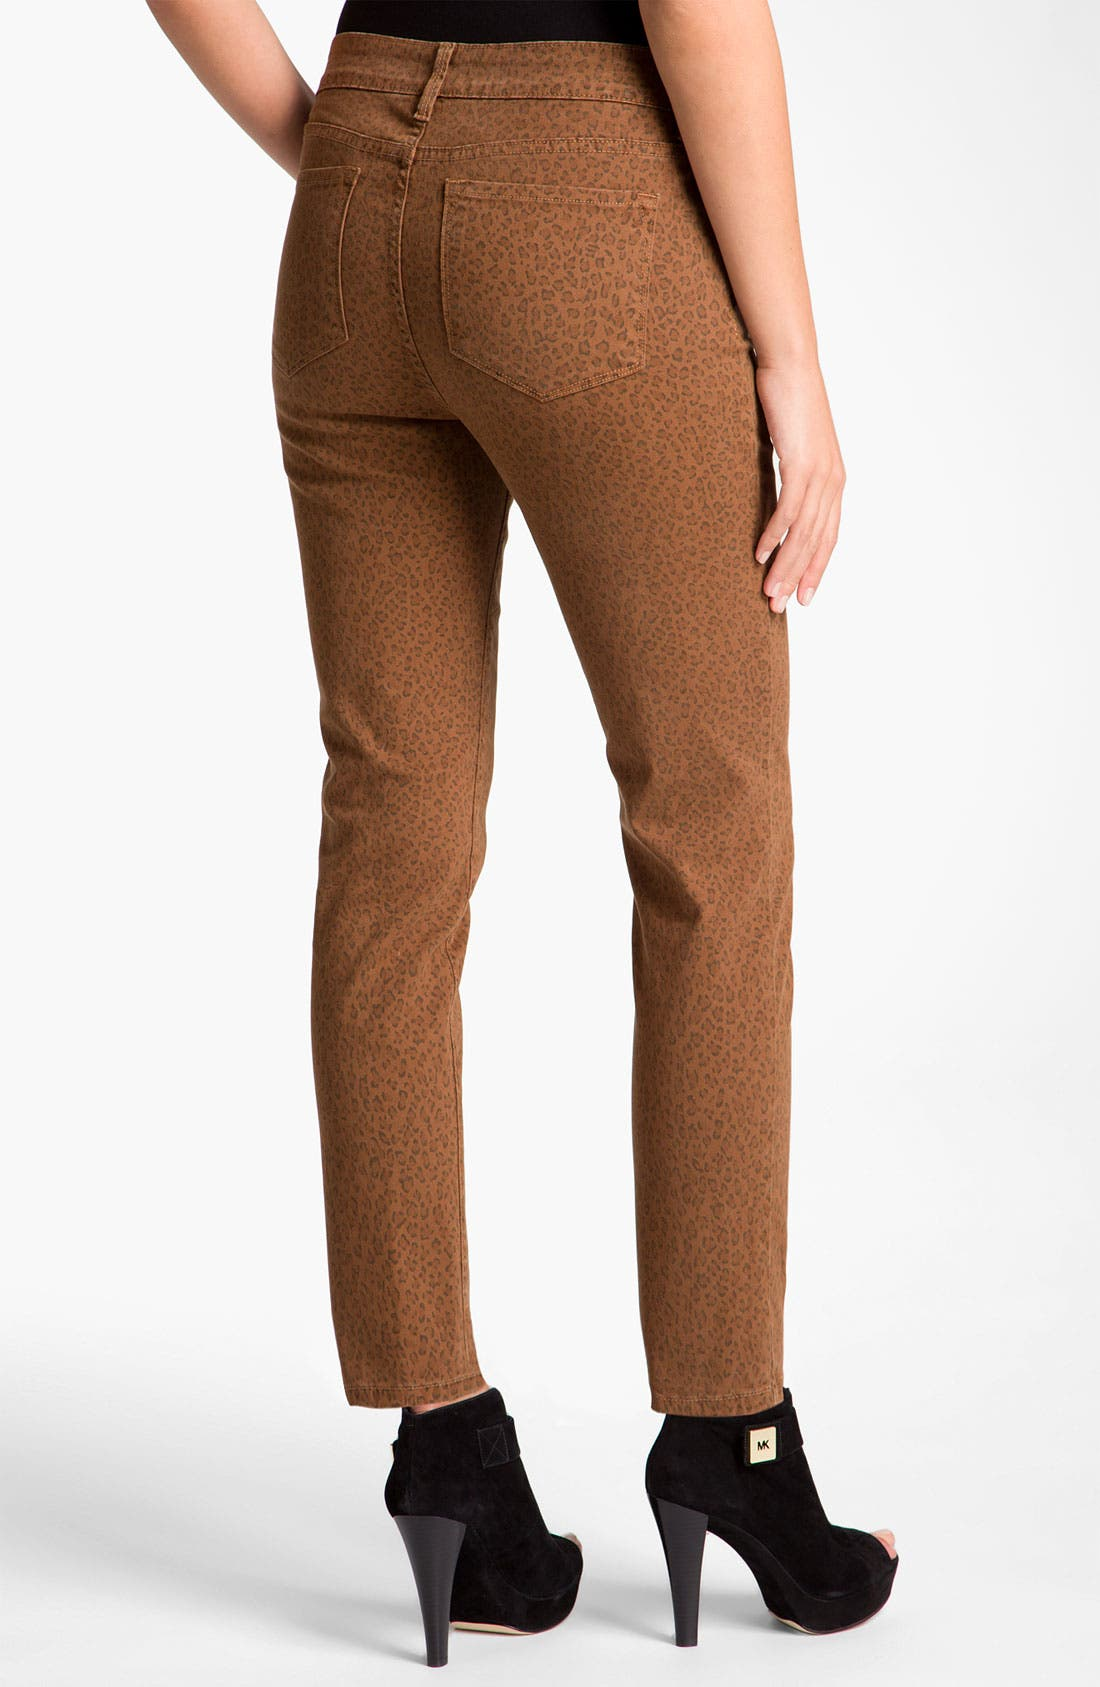 Alternate Image 1 Selected - NYDJ 'Alisha' Leopard Print Twill Ankle Jeans